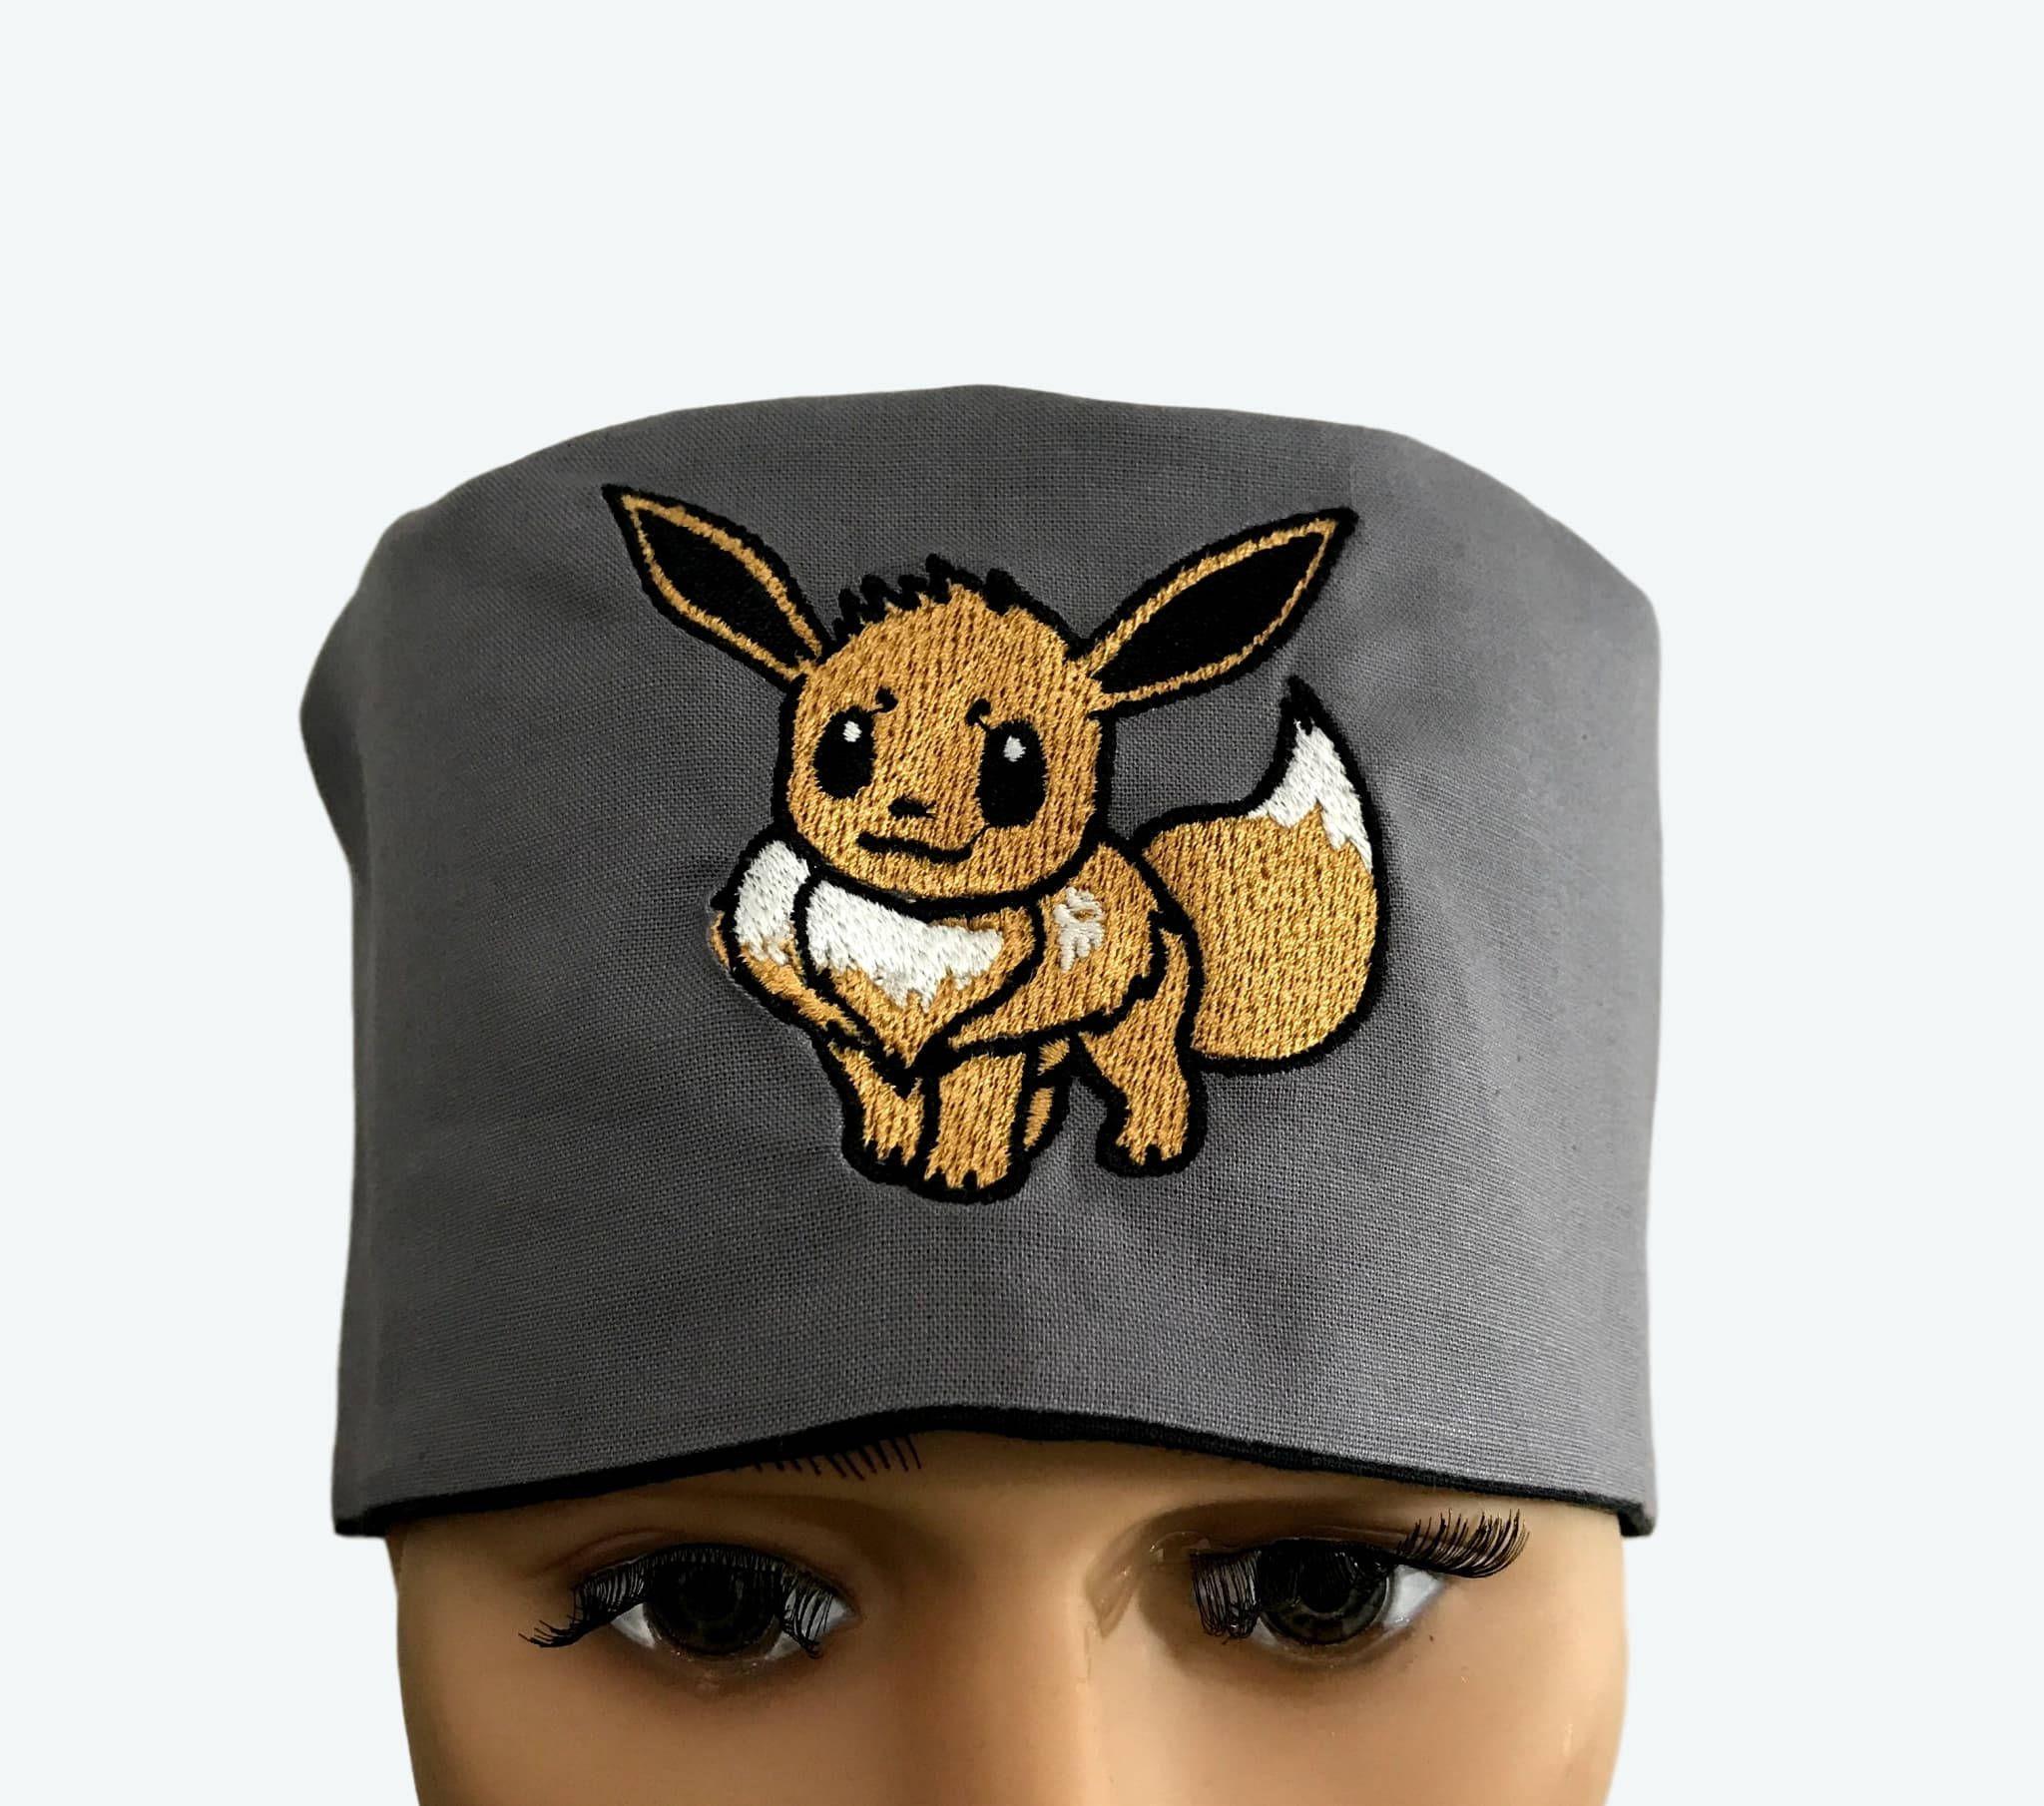 Unisex Scrub Cap - Embroidered Scrub Hat - Scrub Cap - Tech Hat -  Veterinarian Caps